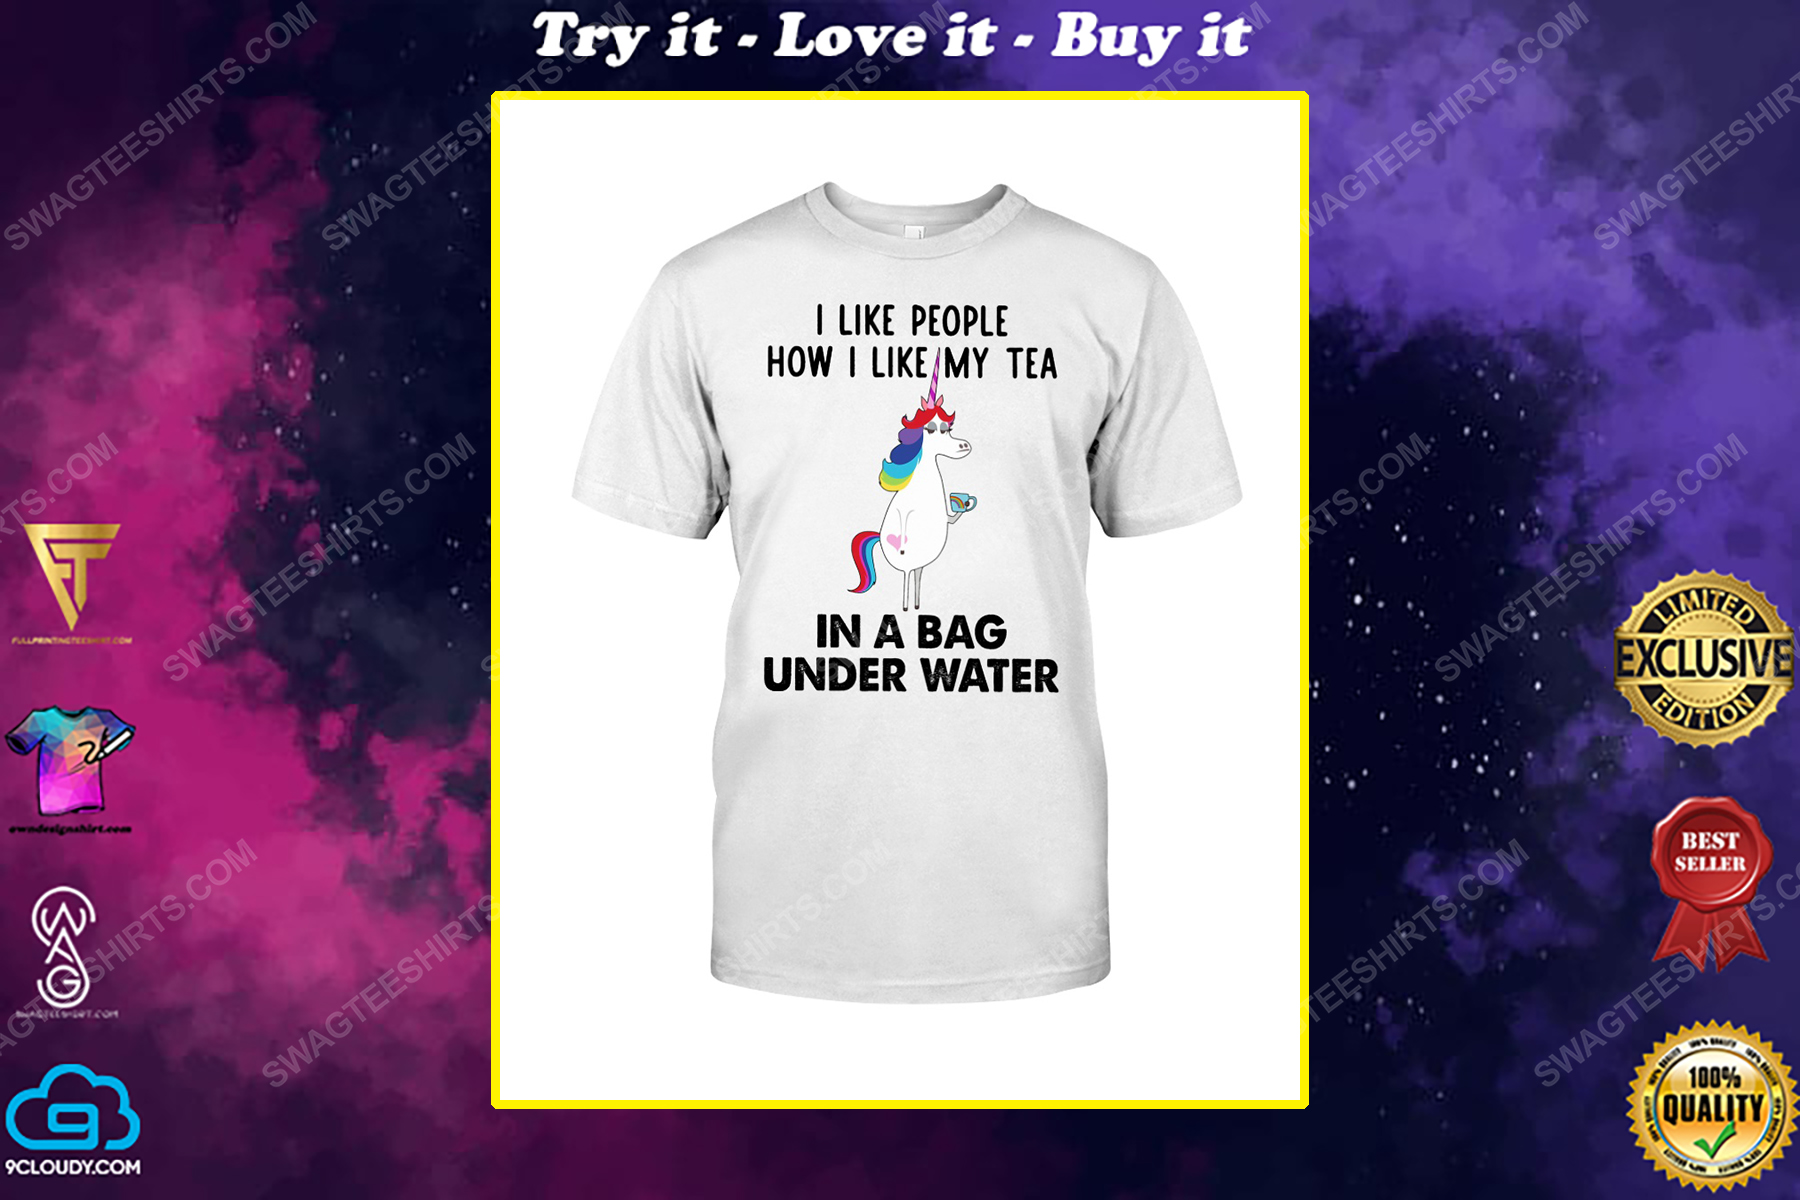 Unicorn i like people how i like my tea in a bag under water shirt